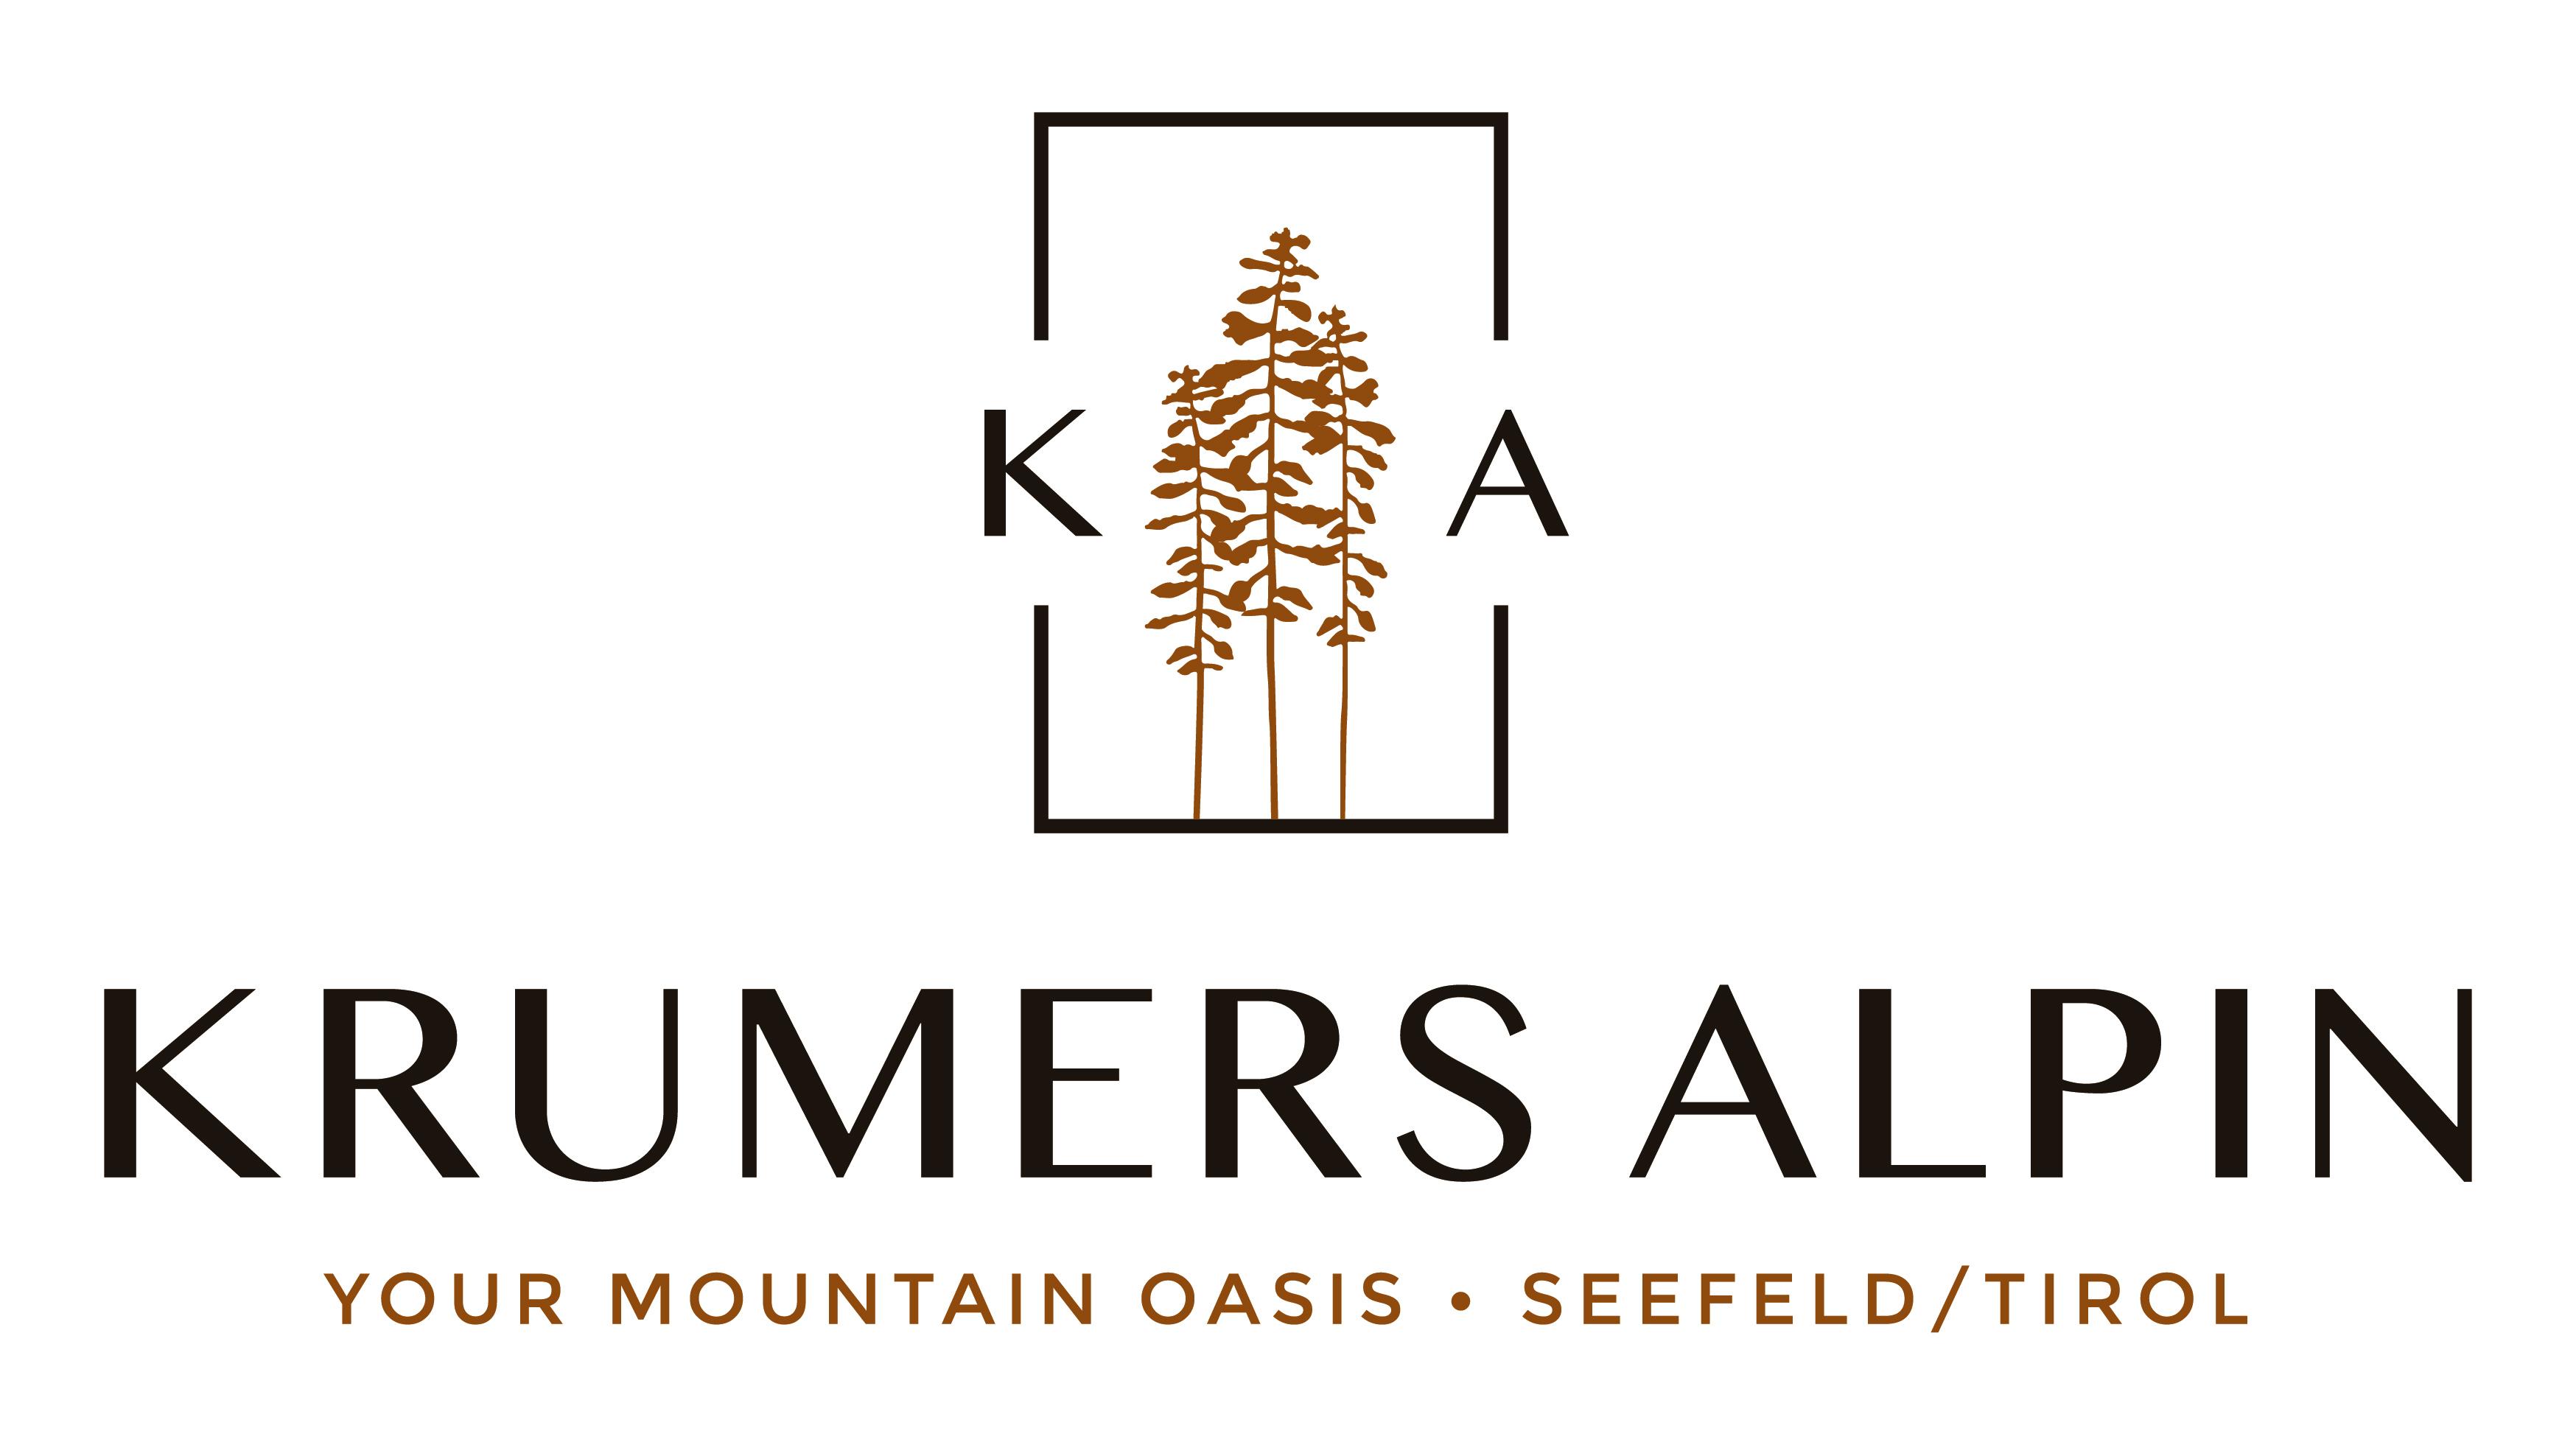 (c)Krumers Alpin - Your Mountain Oasis